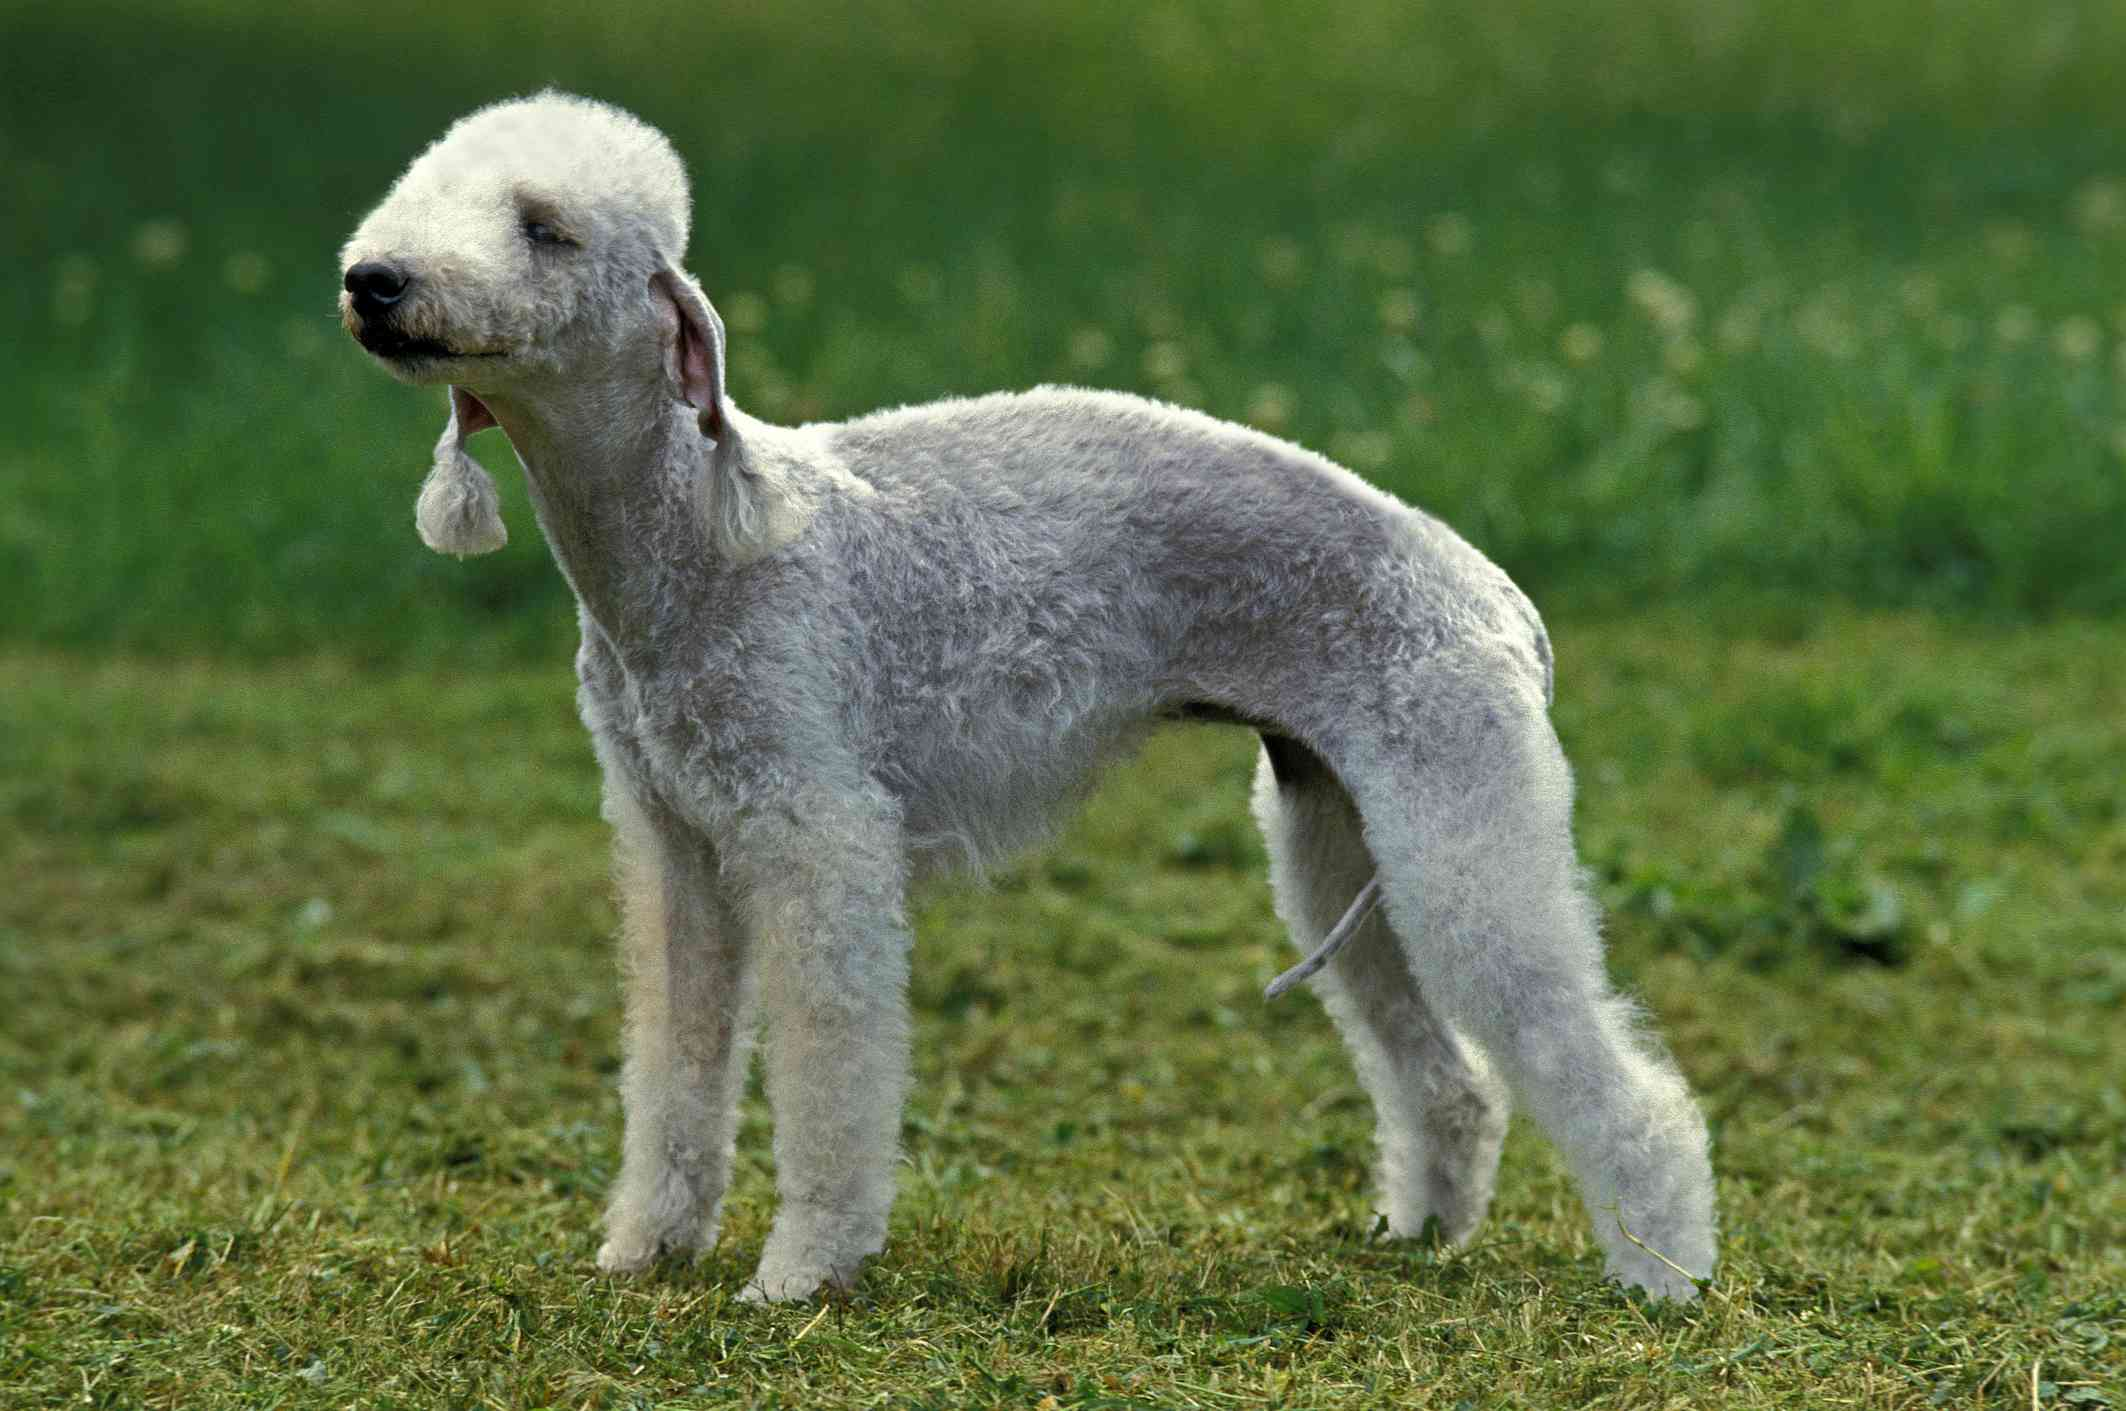 Bedlington Terrier, Adult standing on Grass